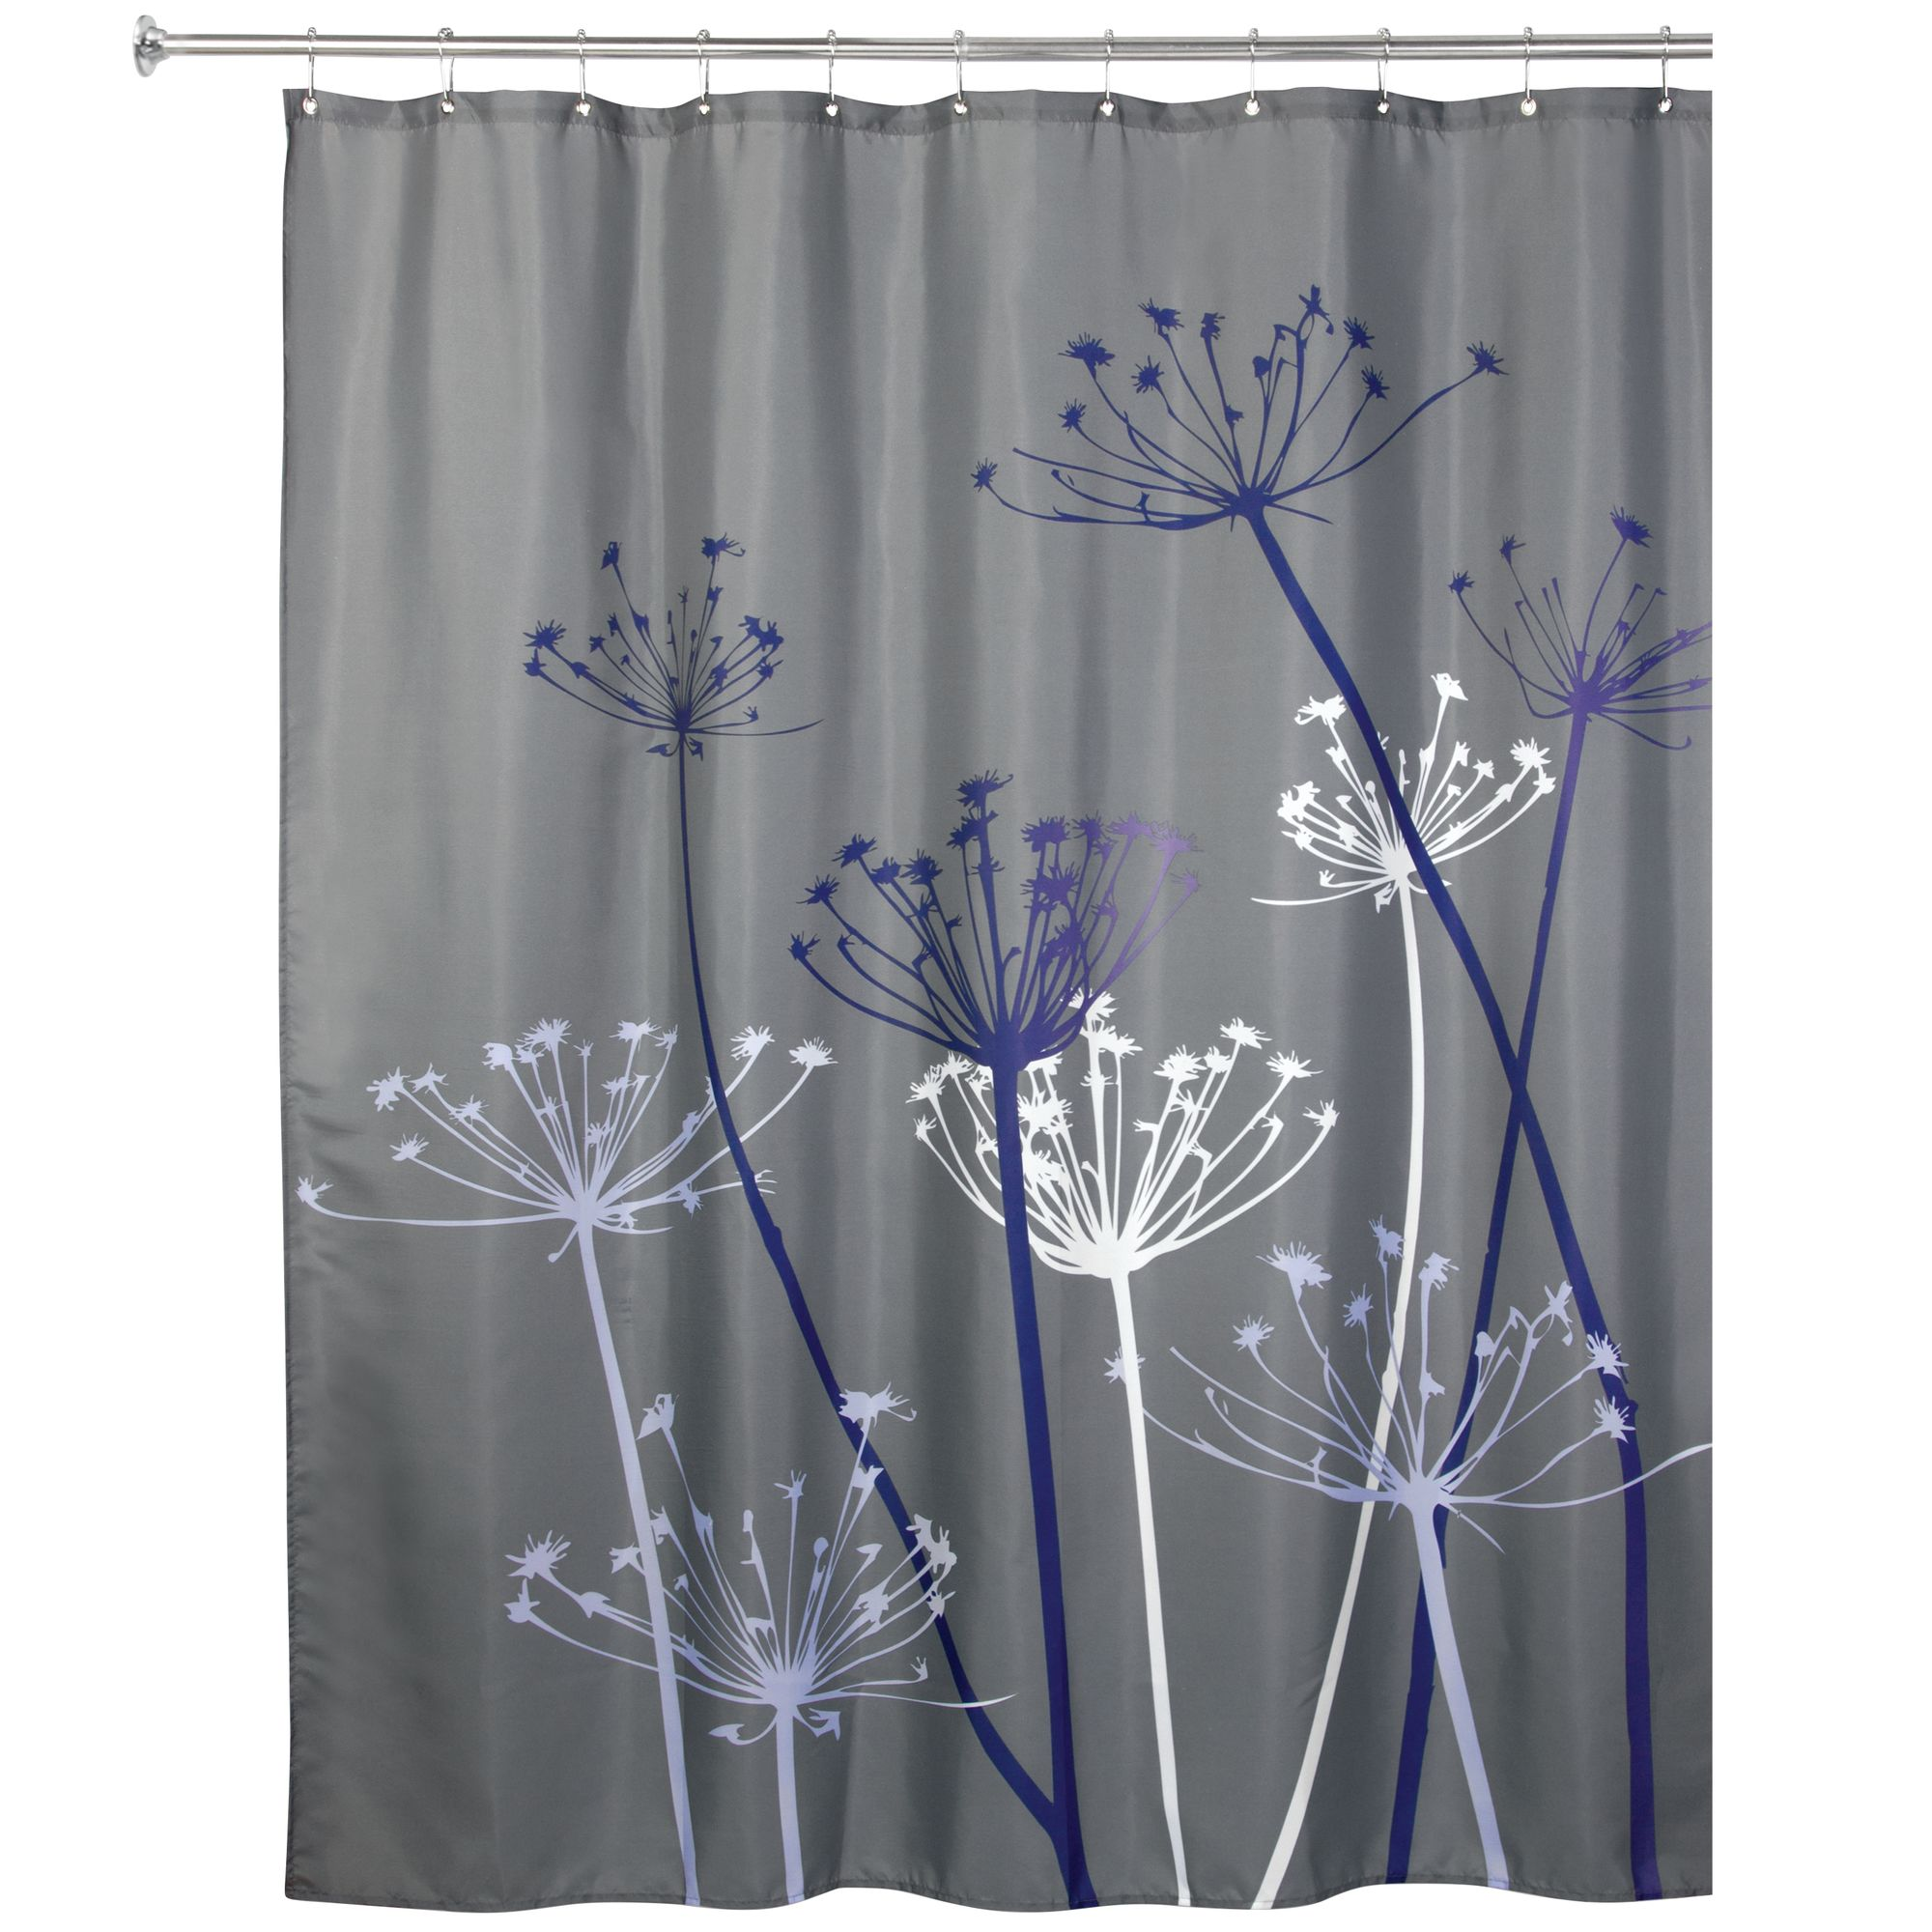 interdesign thistle fabric shower curtain standard 72 x 72 gray purple